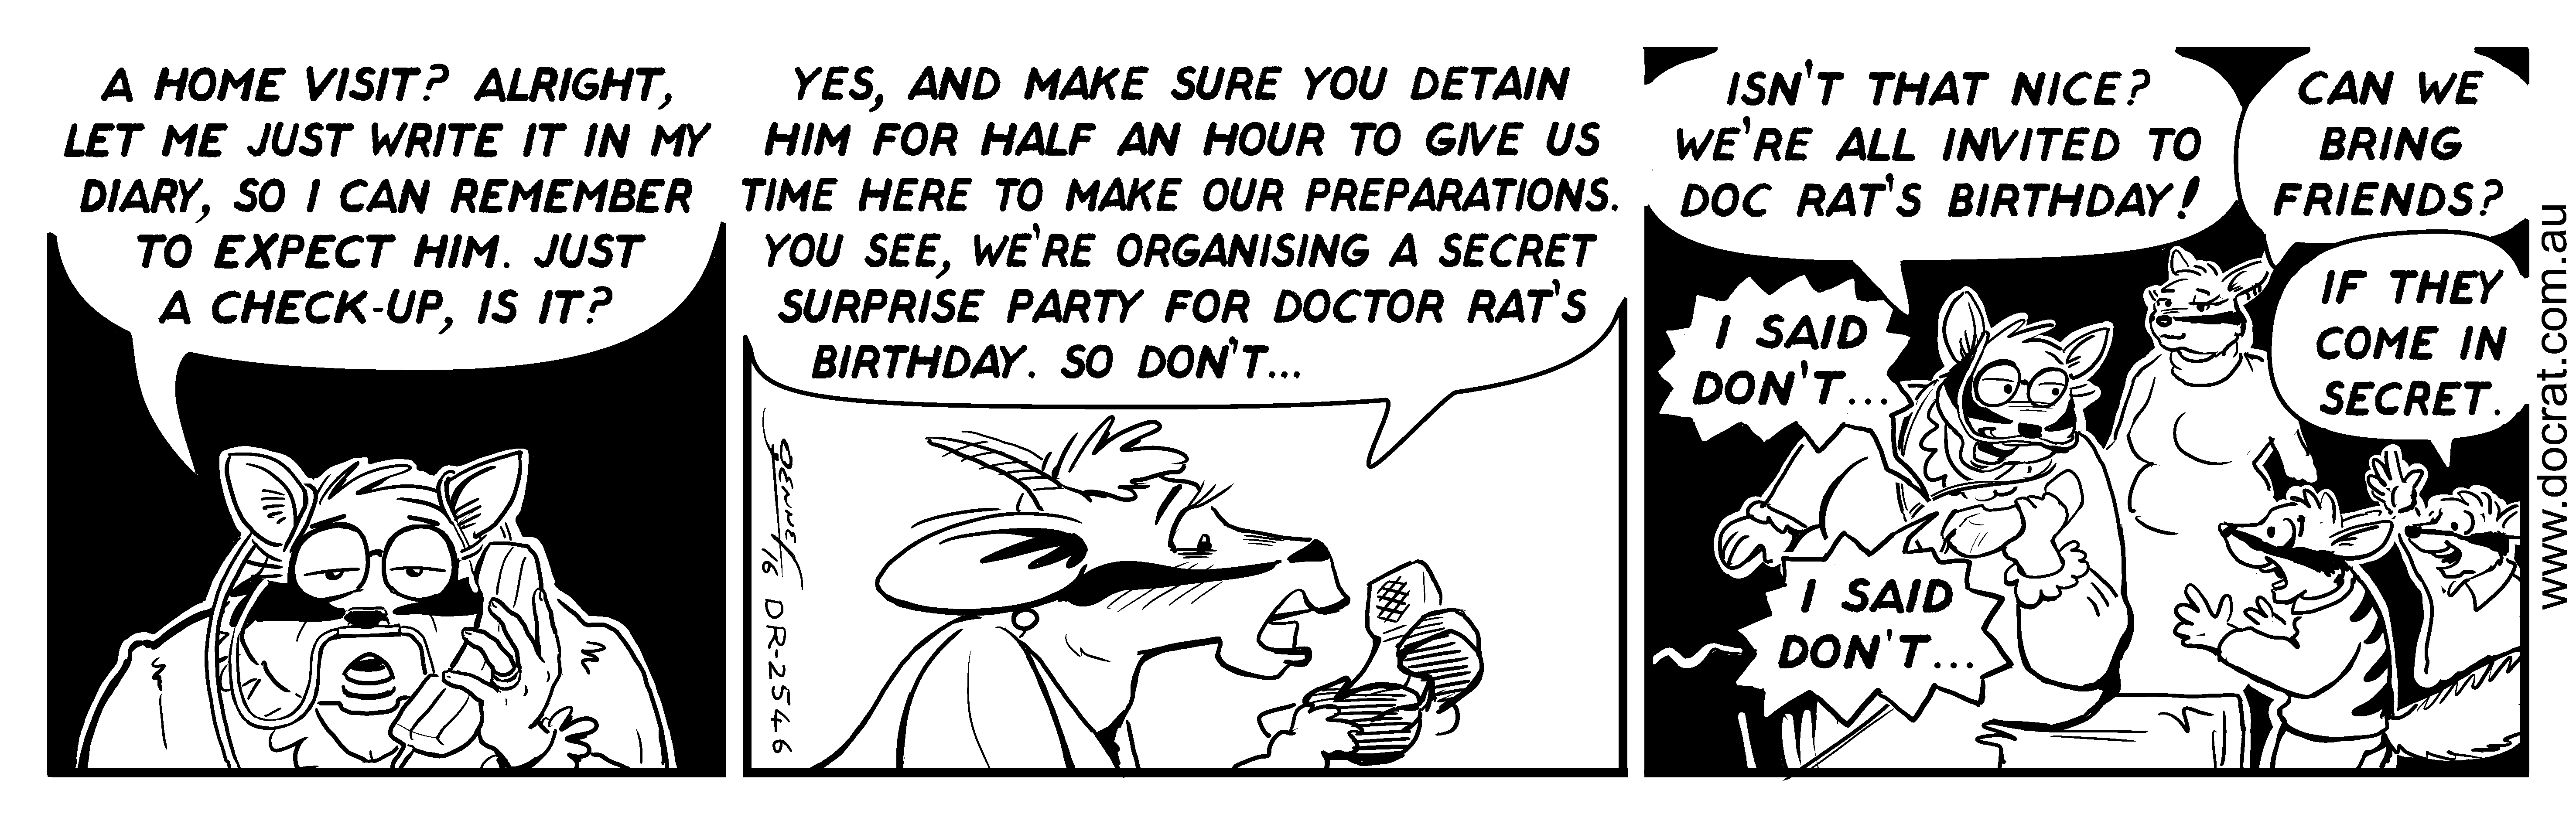 20160613